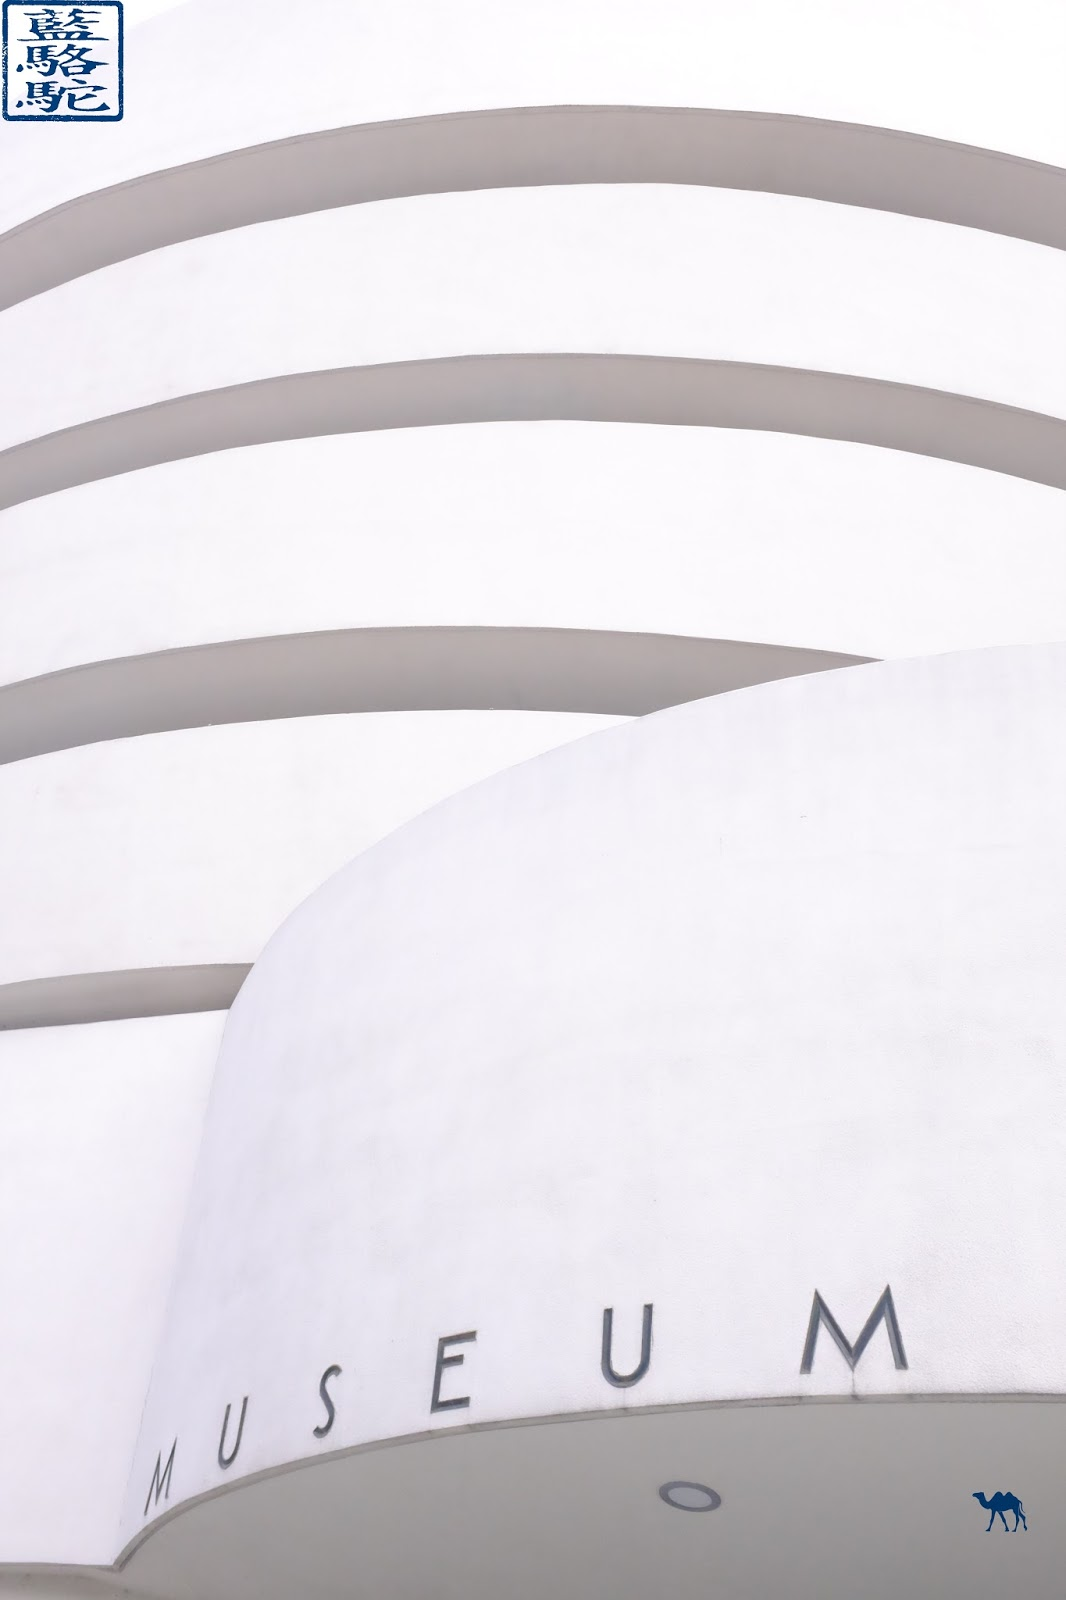 Le Chameau Bleu - Balade à New York - Architecture du Musée Guggenheim